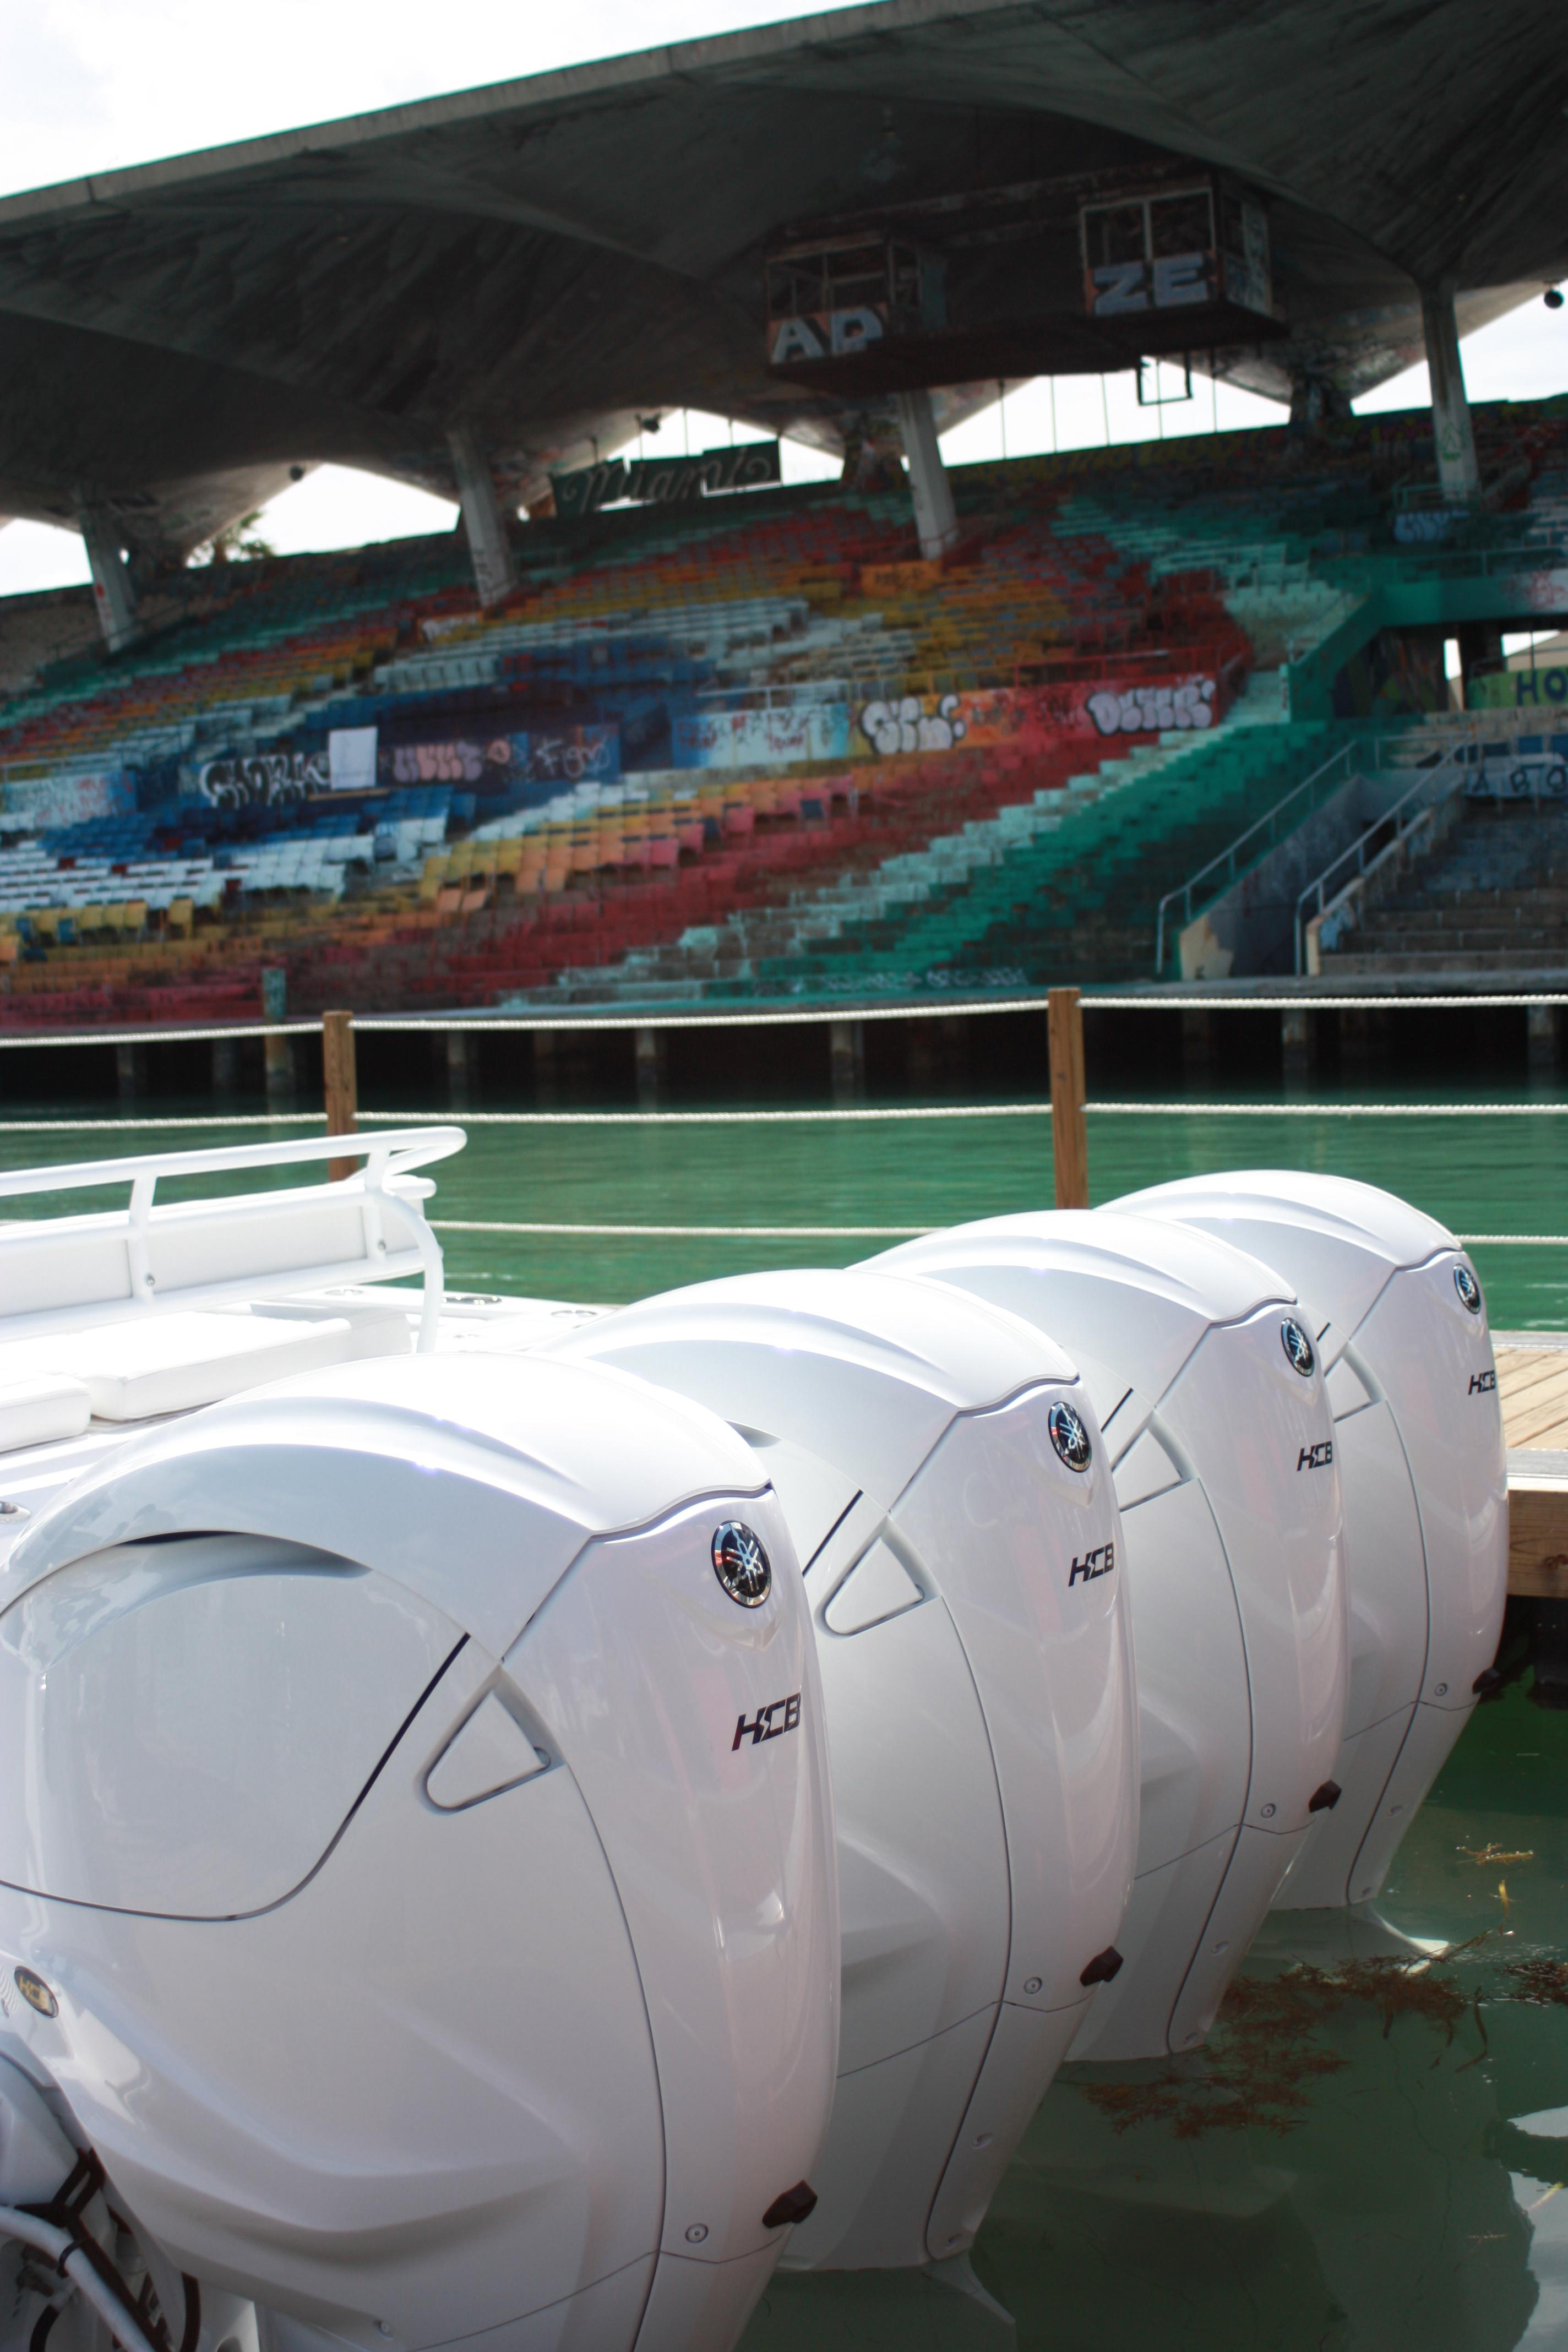 2 stadium.JPG